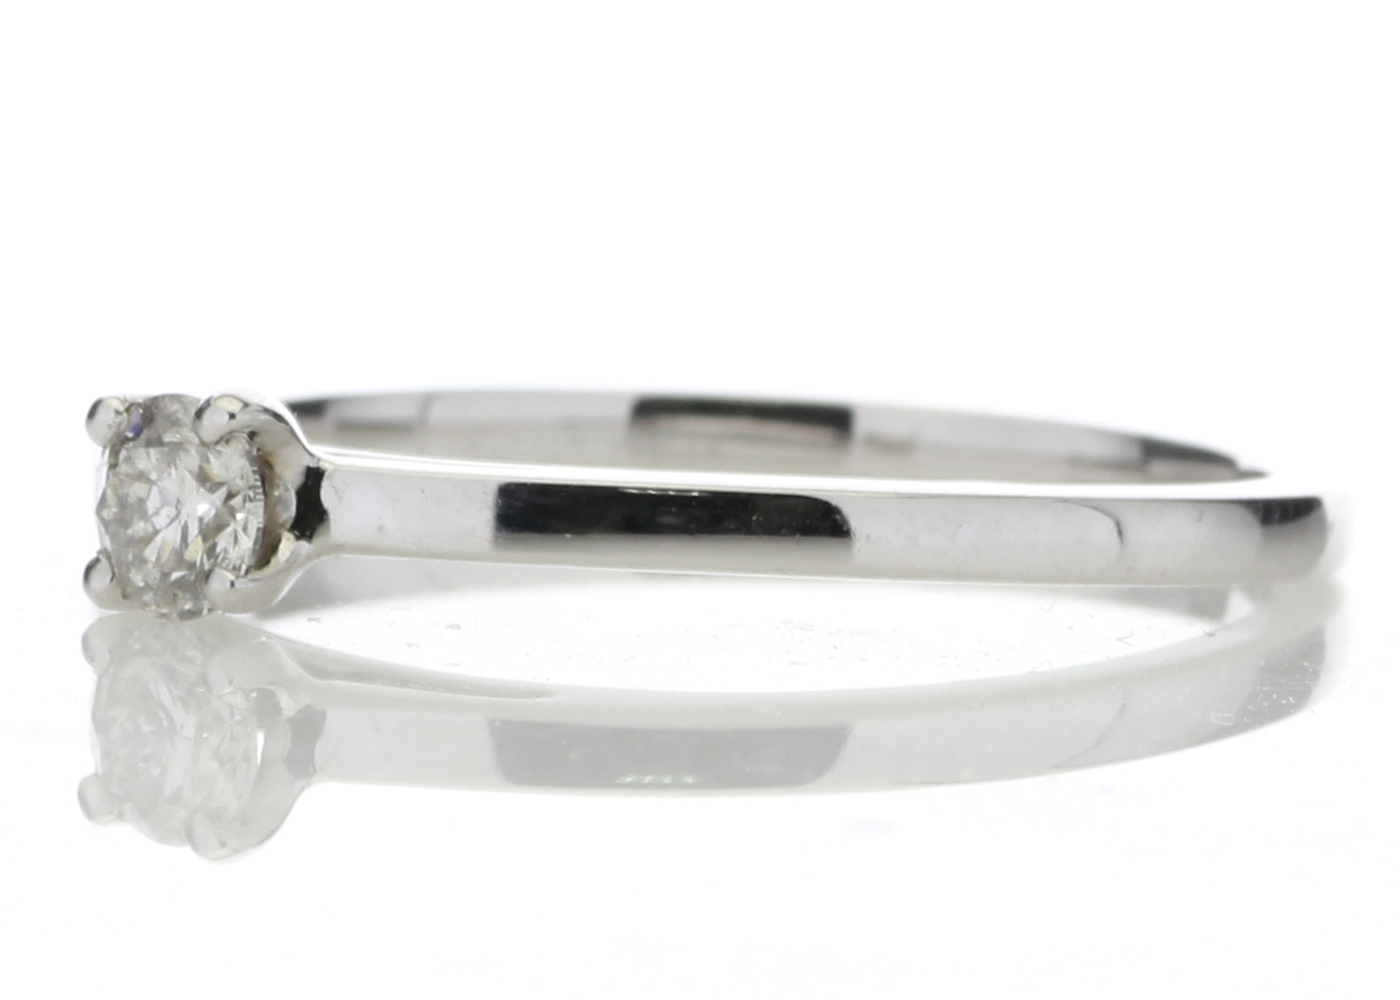 18ct White Gold Single Stone Wire Set Diamond Ring 0.20 Carats - Image 2 of 4